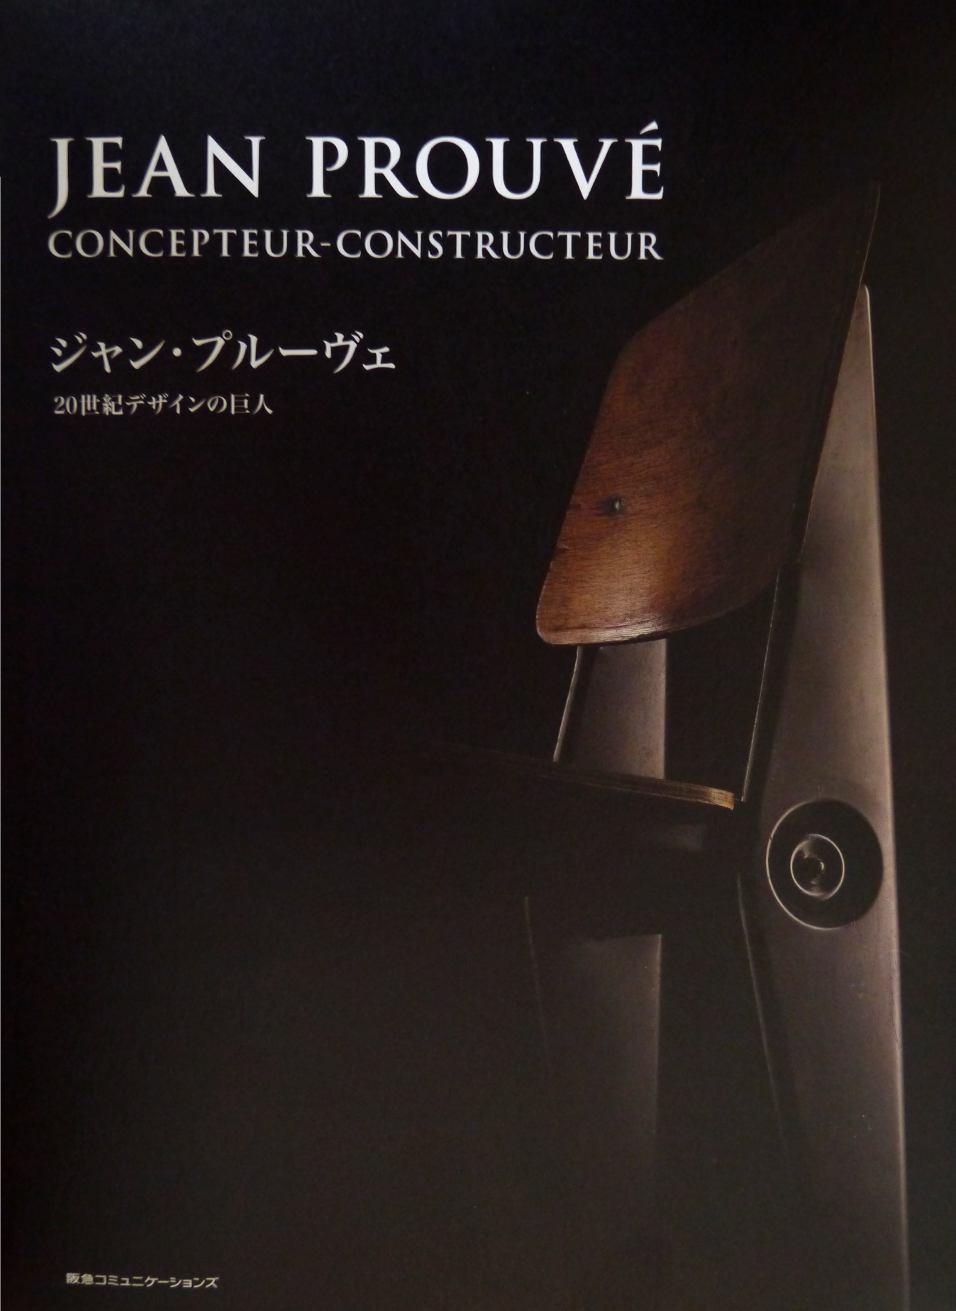 JEAN PROUVE -20世紀デザインの巨人-